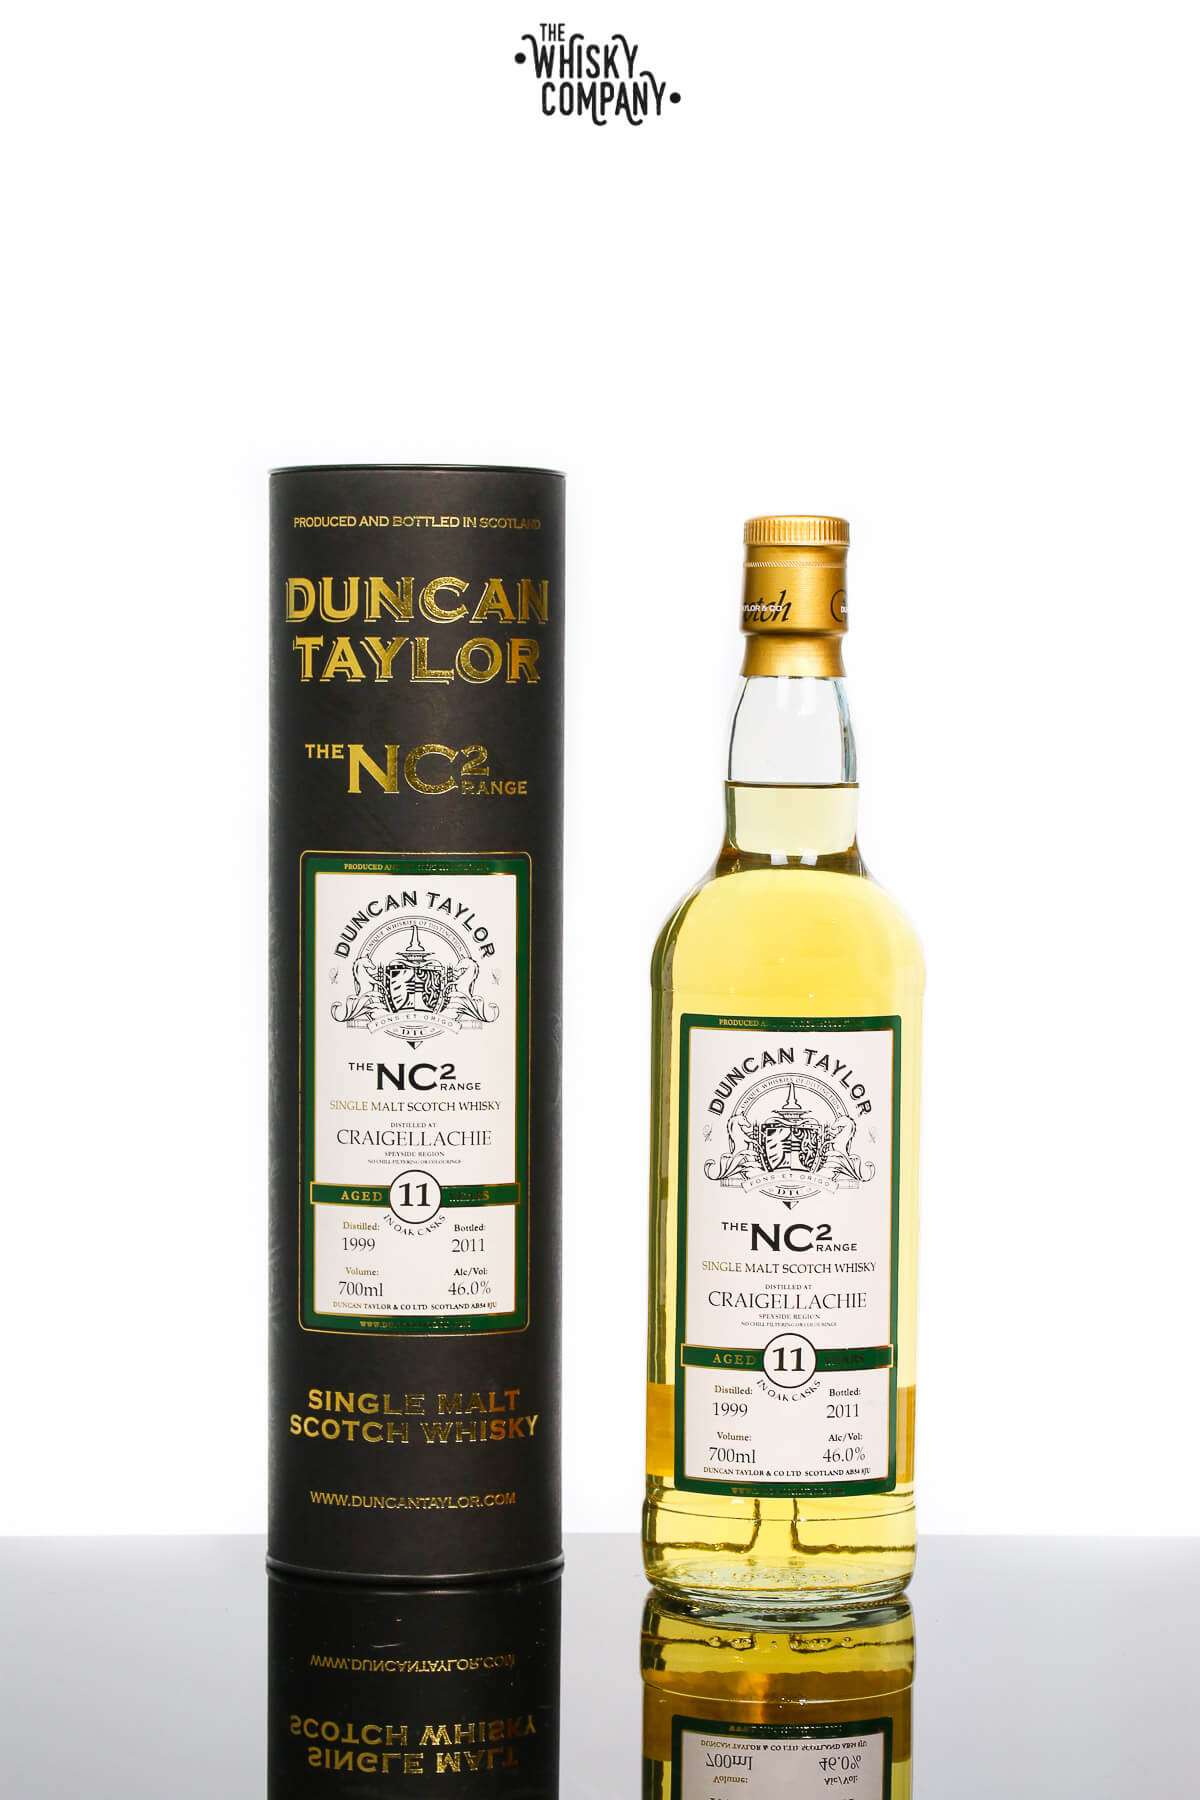 Duncan Taylor 'The NC2 Range' Craigellachie Aged 11 Years Single Malt Scotch Whisky